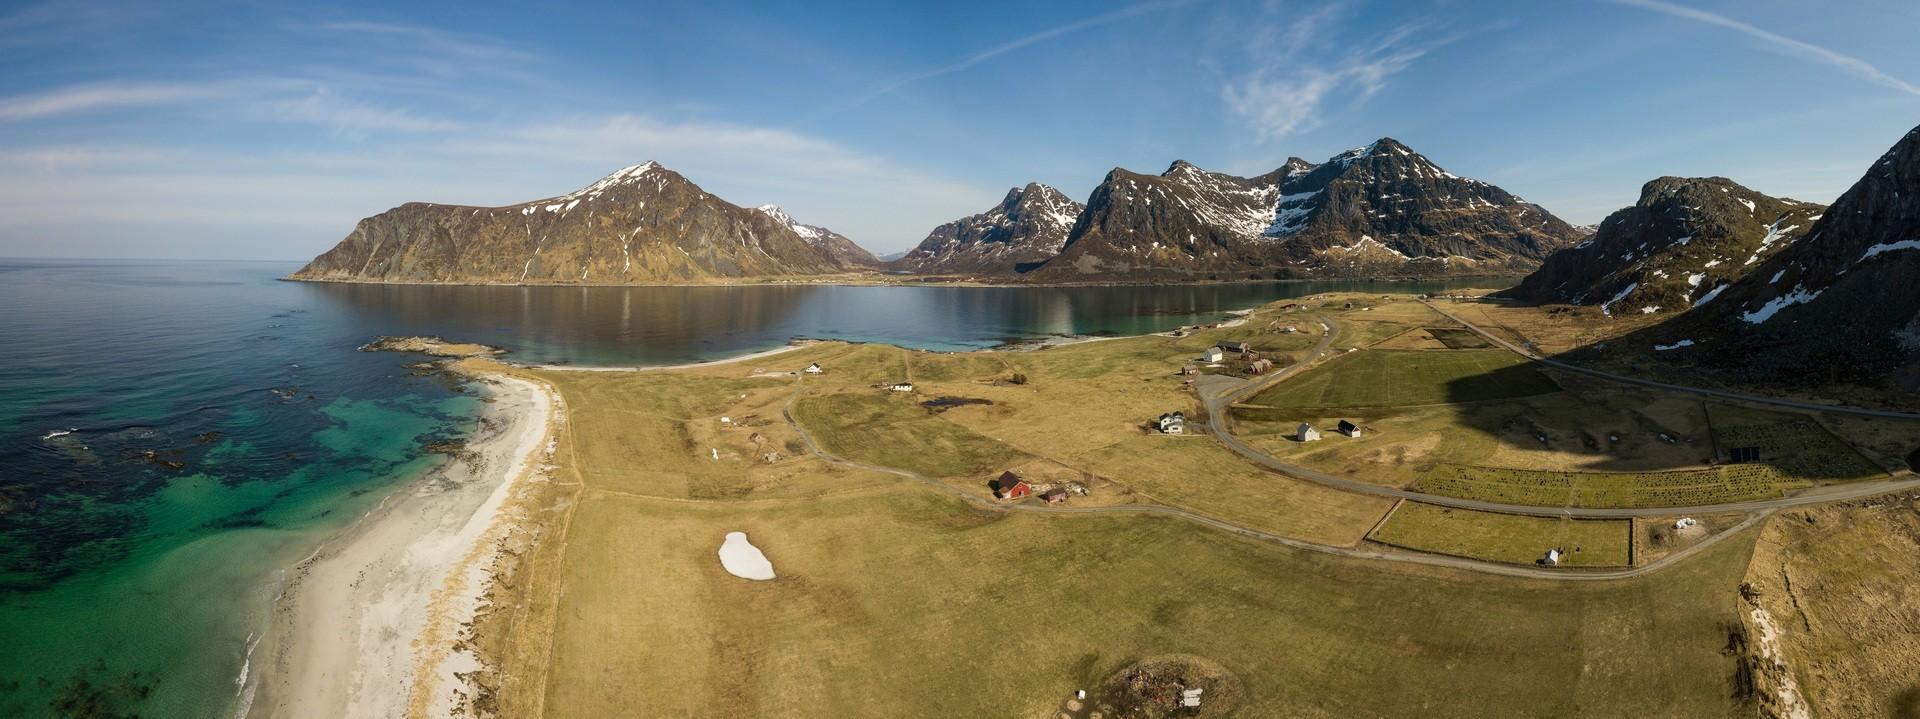 Panoramaaufnahmen Drohne Luftbild Tourismus Marketing